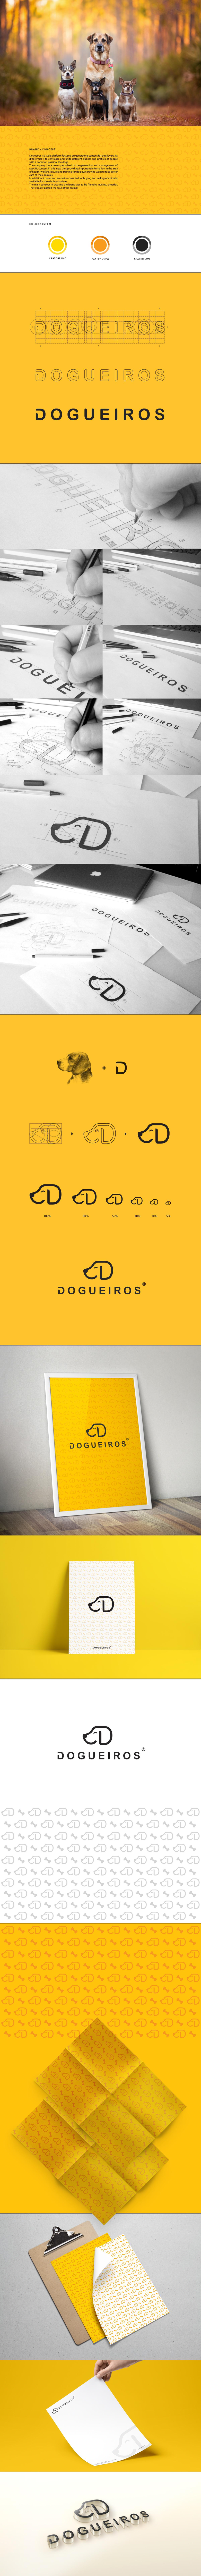 dog branding  graphicdesign logo ux curadory visual identity brand Logotype Golden Ratio